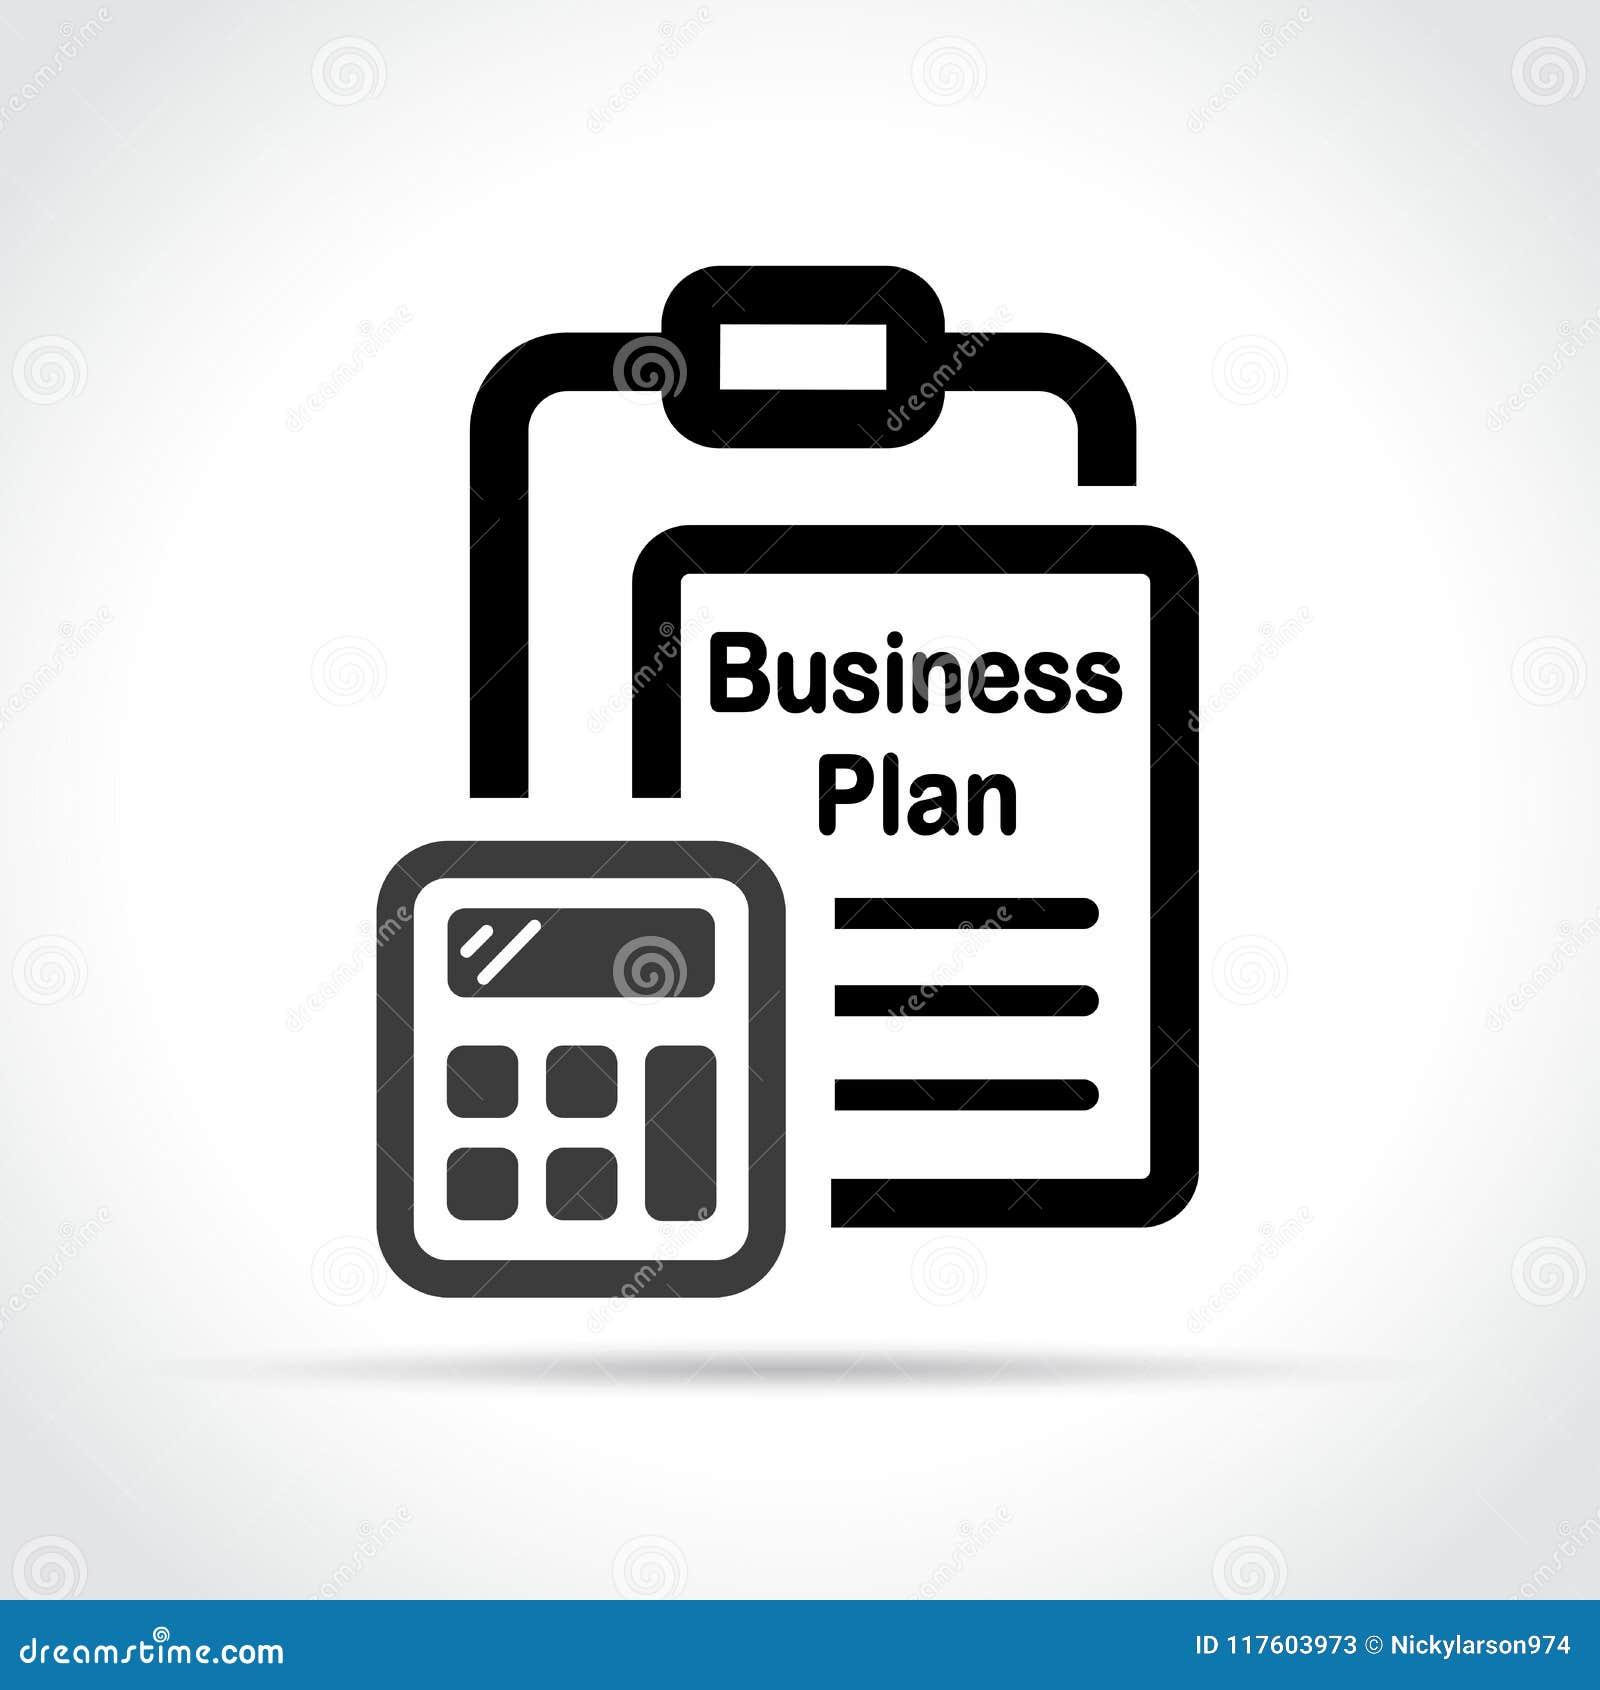 Business plan icon free essay editing